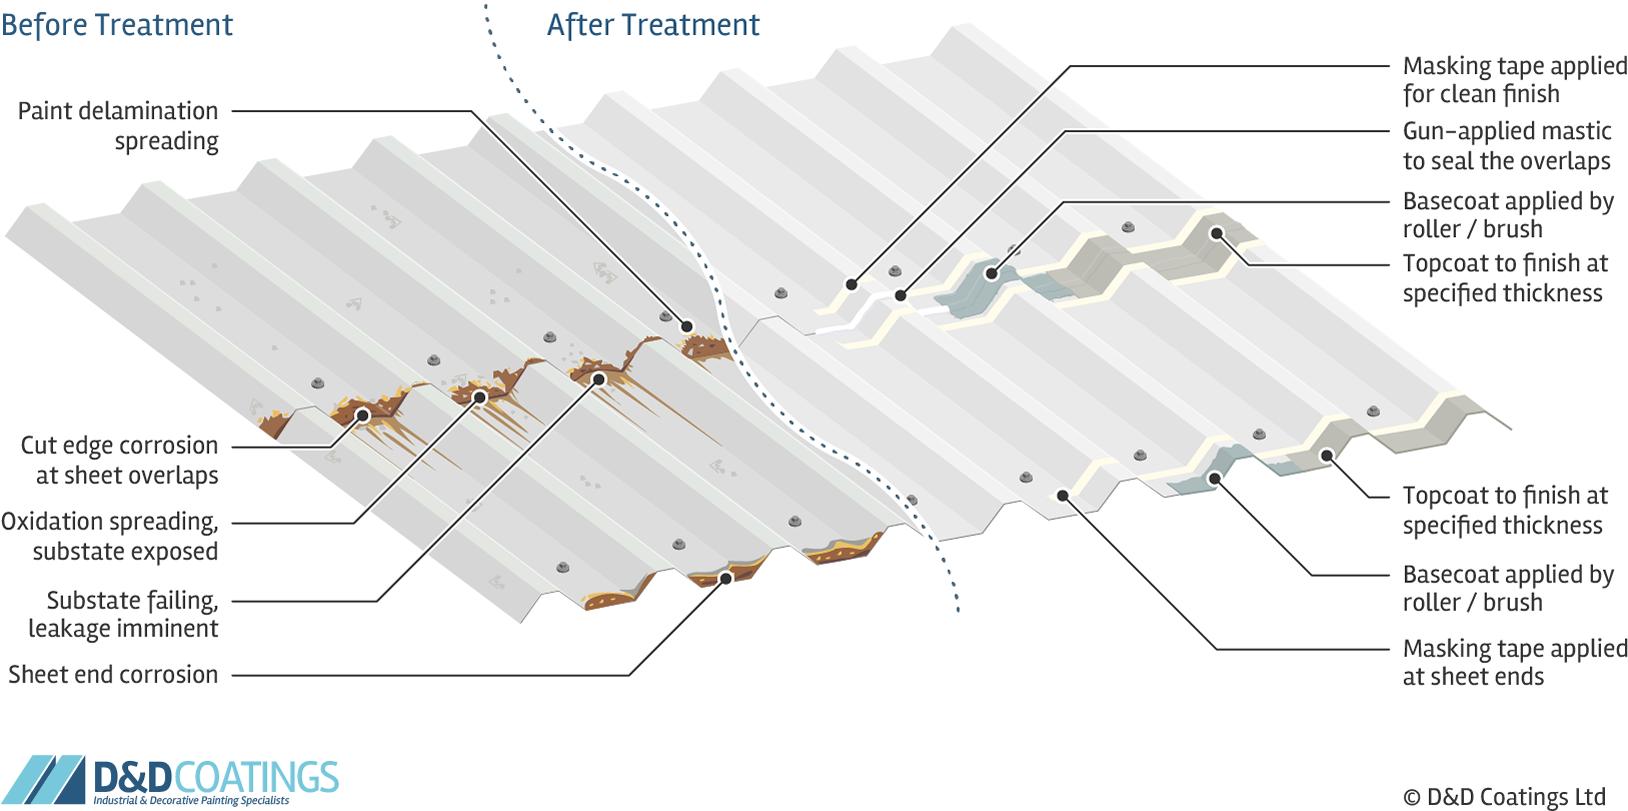 cut edge corrosion treatment process explained